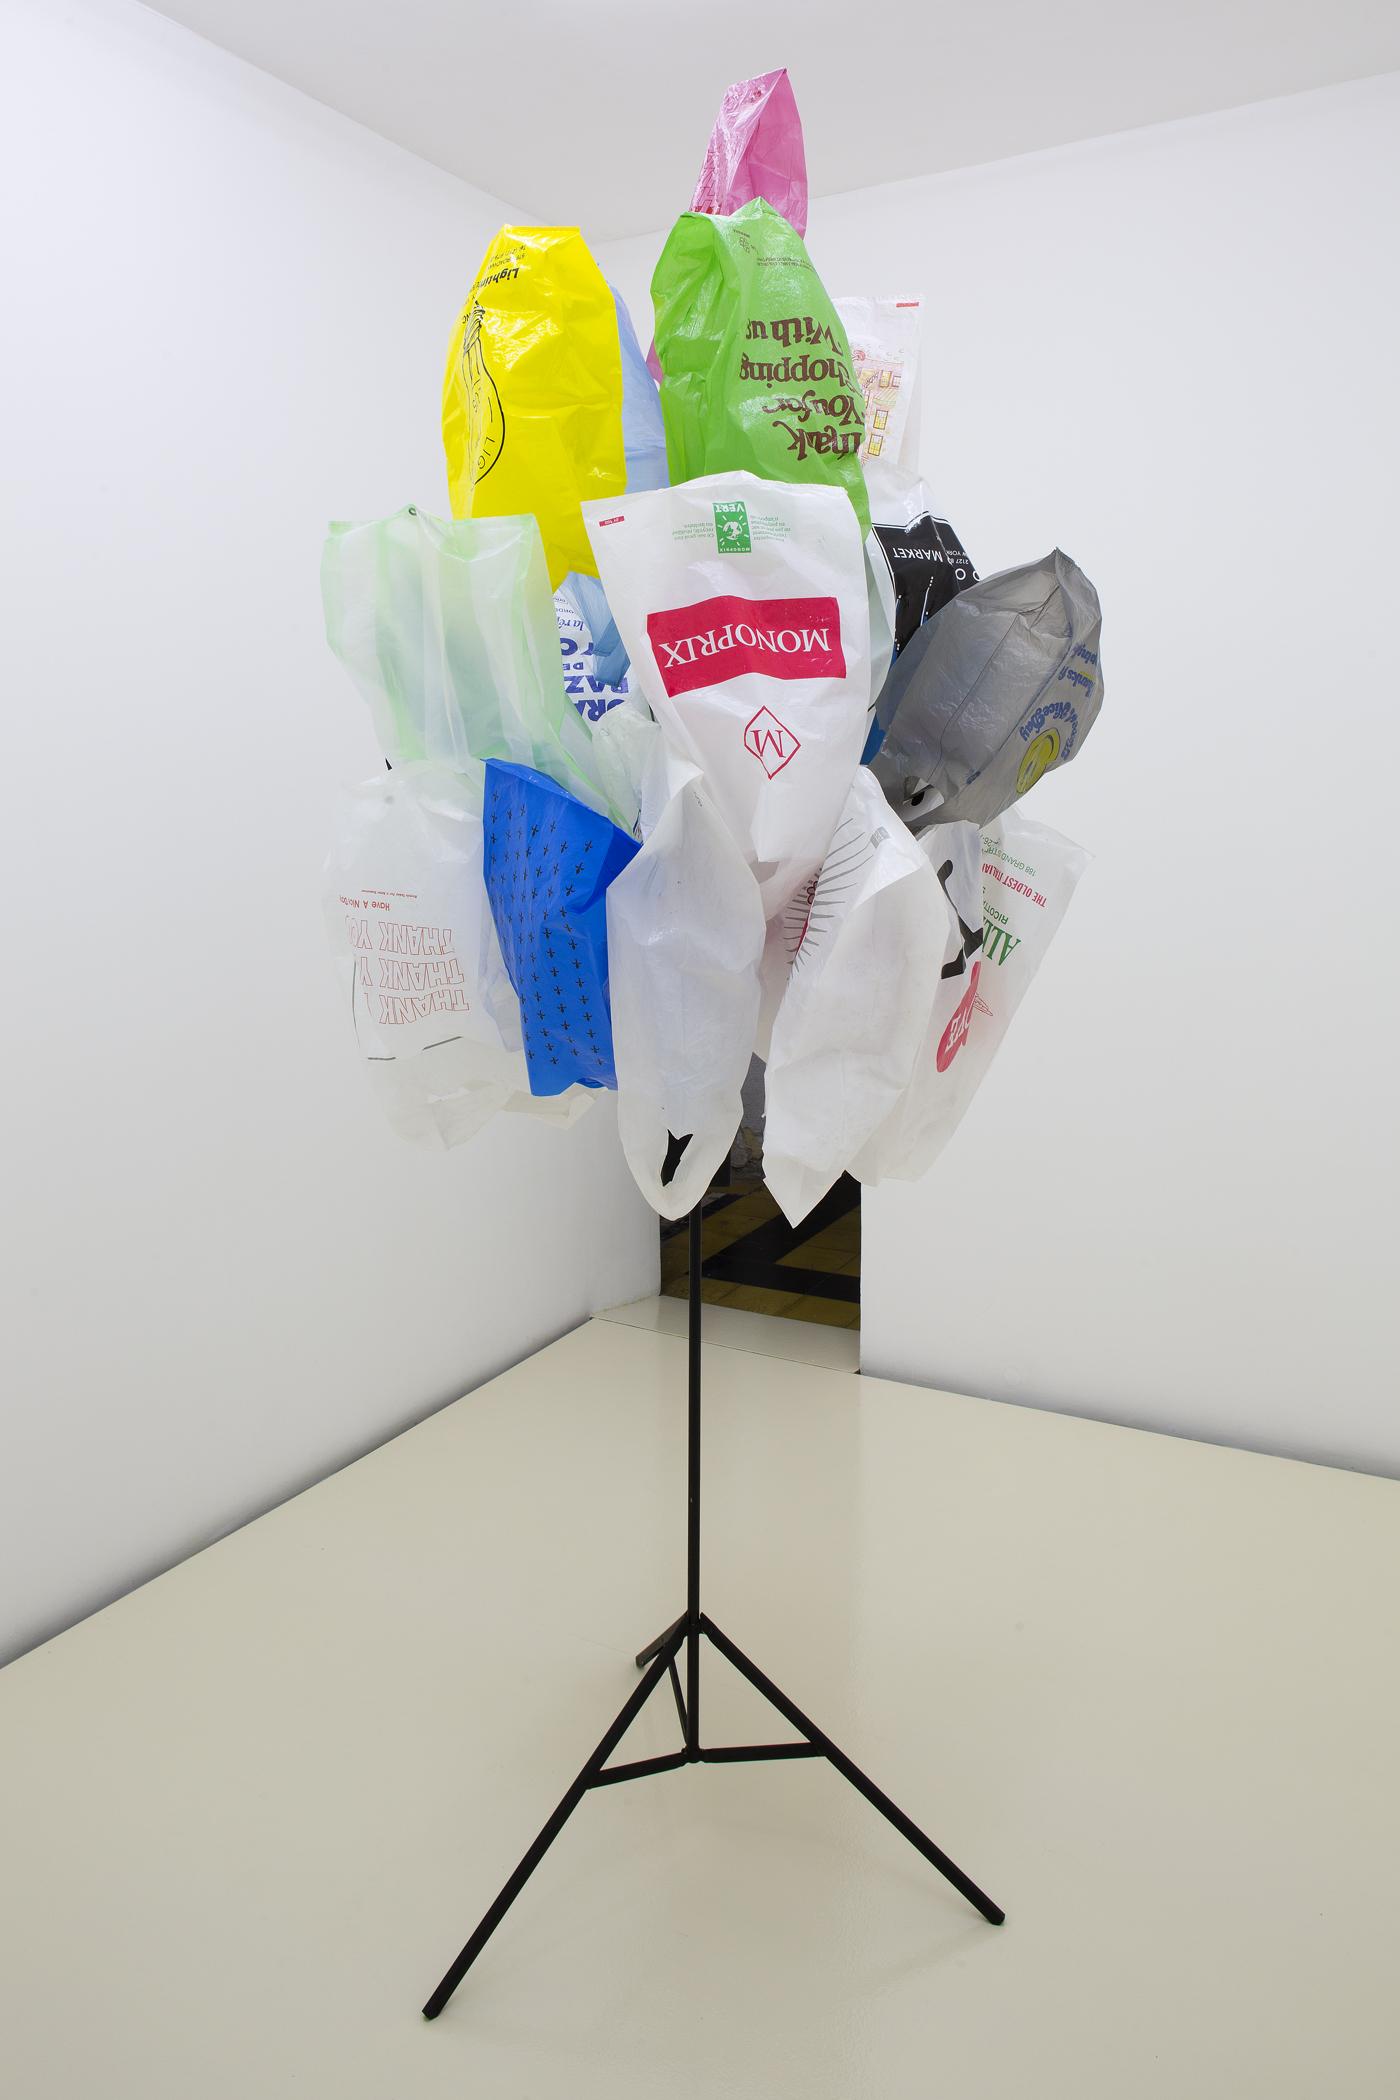 Bunch #4, 1996, Metal, wood, wire, enamel paint, plastic bags, ca. 250 cm high